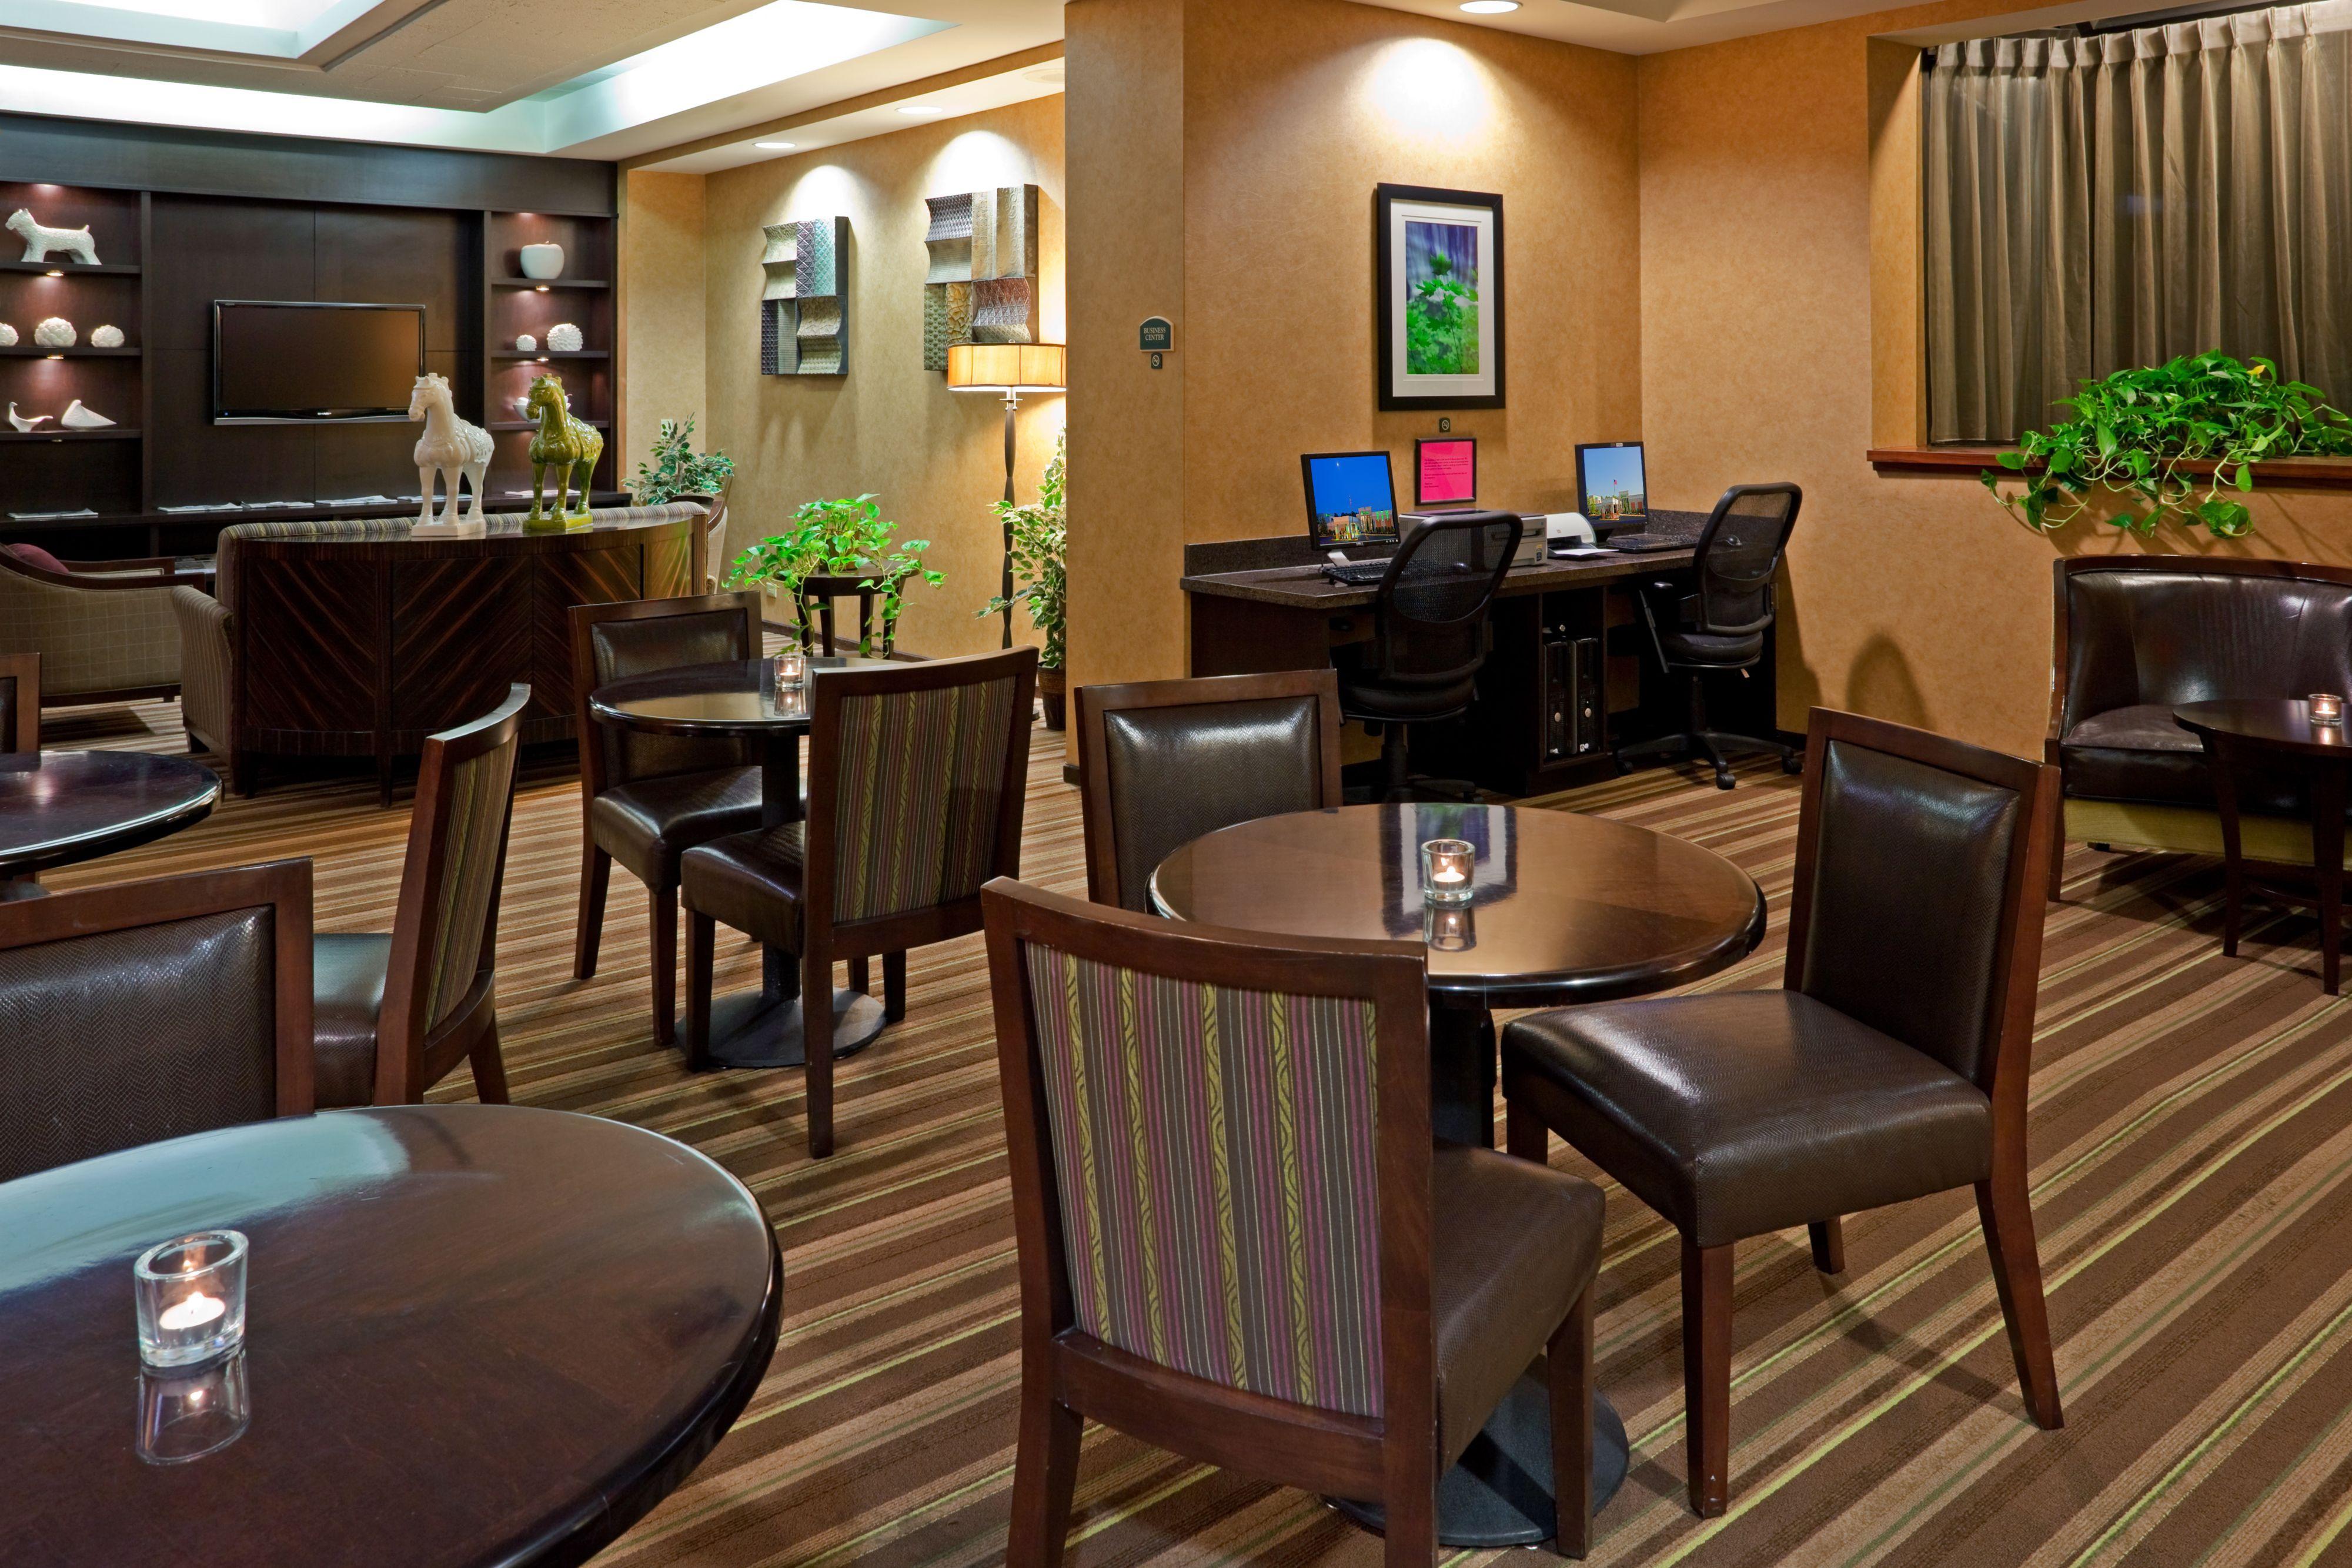 Holiday Inn Orangeburg-Rockland/Bergen Co image 5